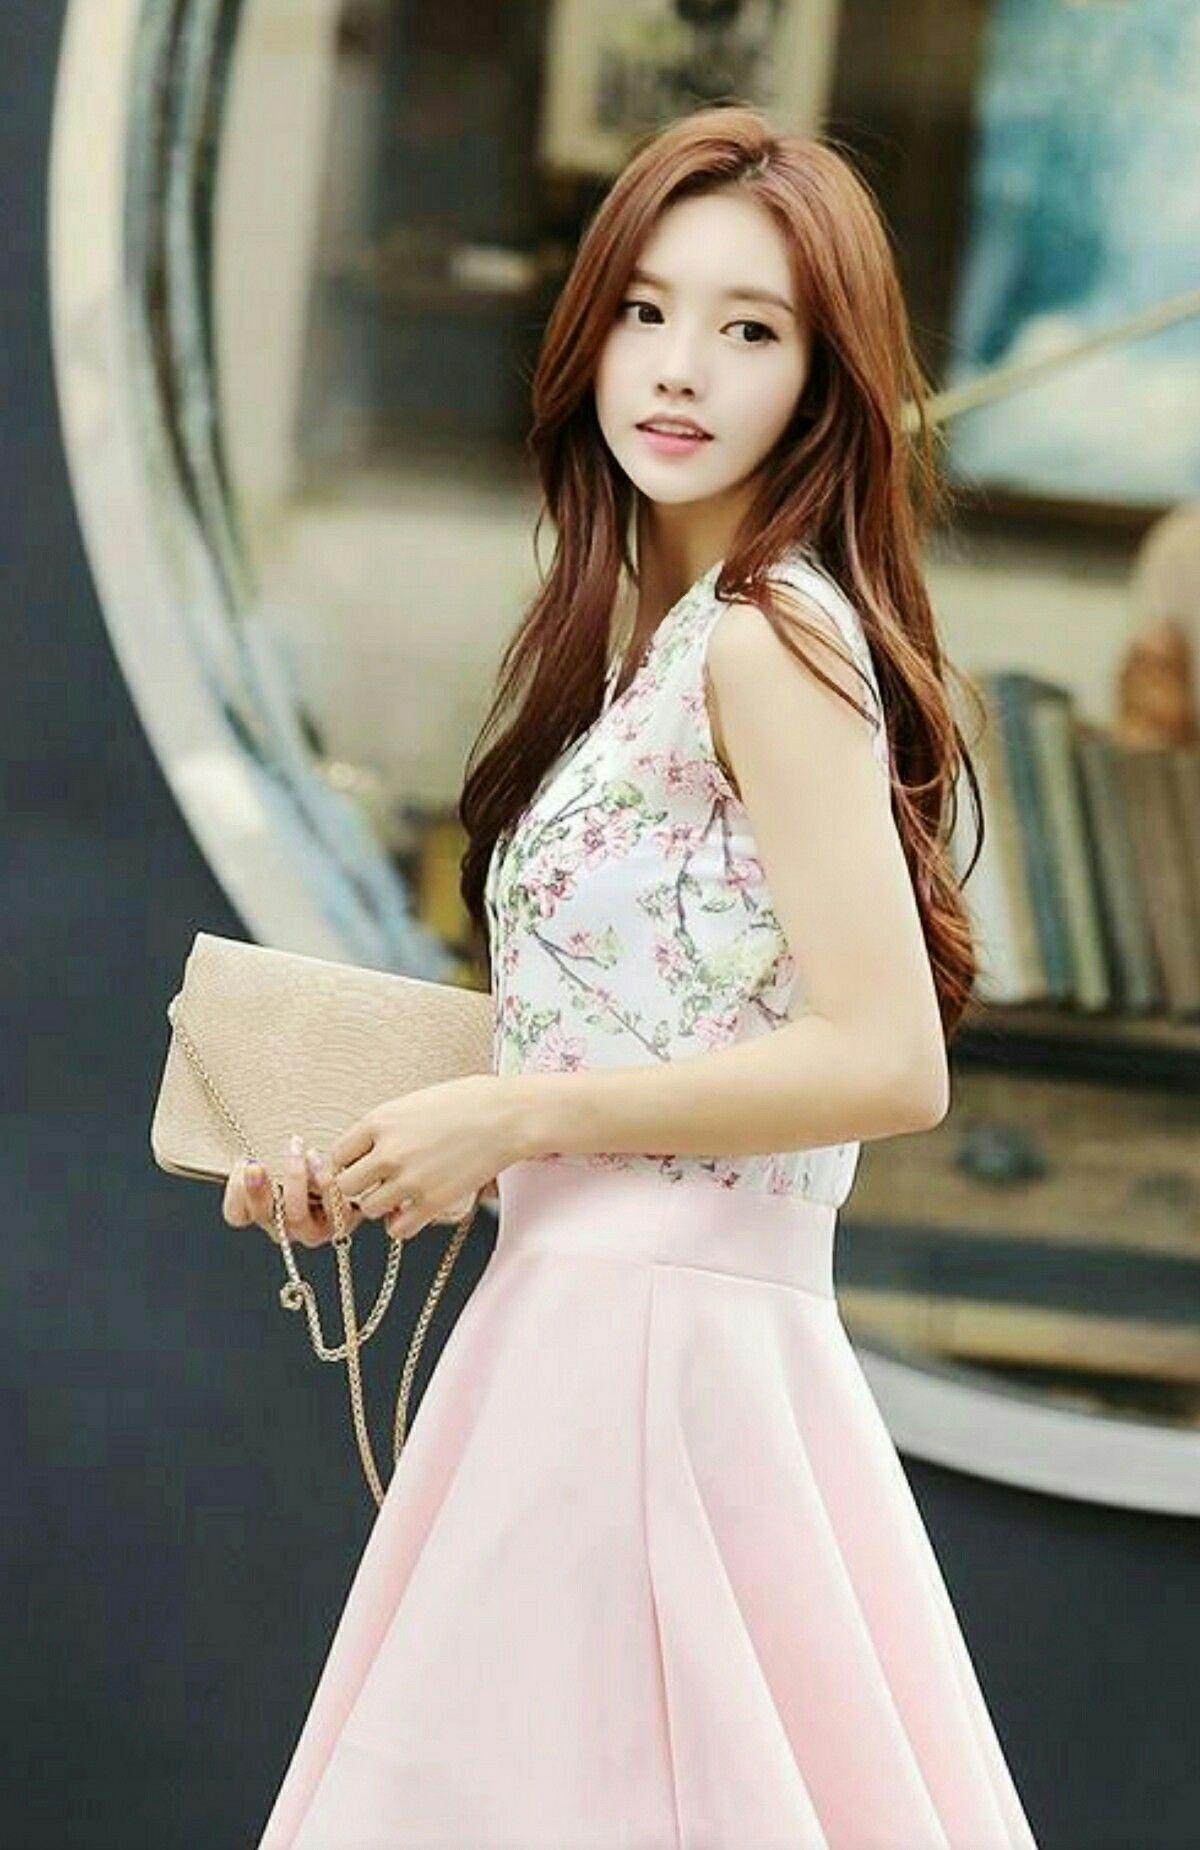 6 Pretty Korean Fashion Style Ideas That Women Should Try